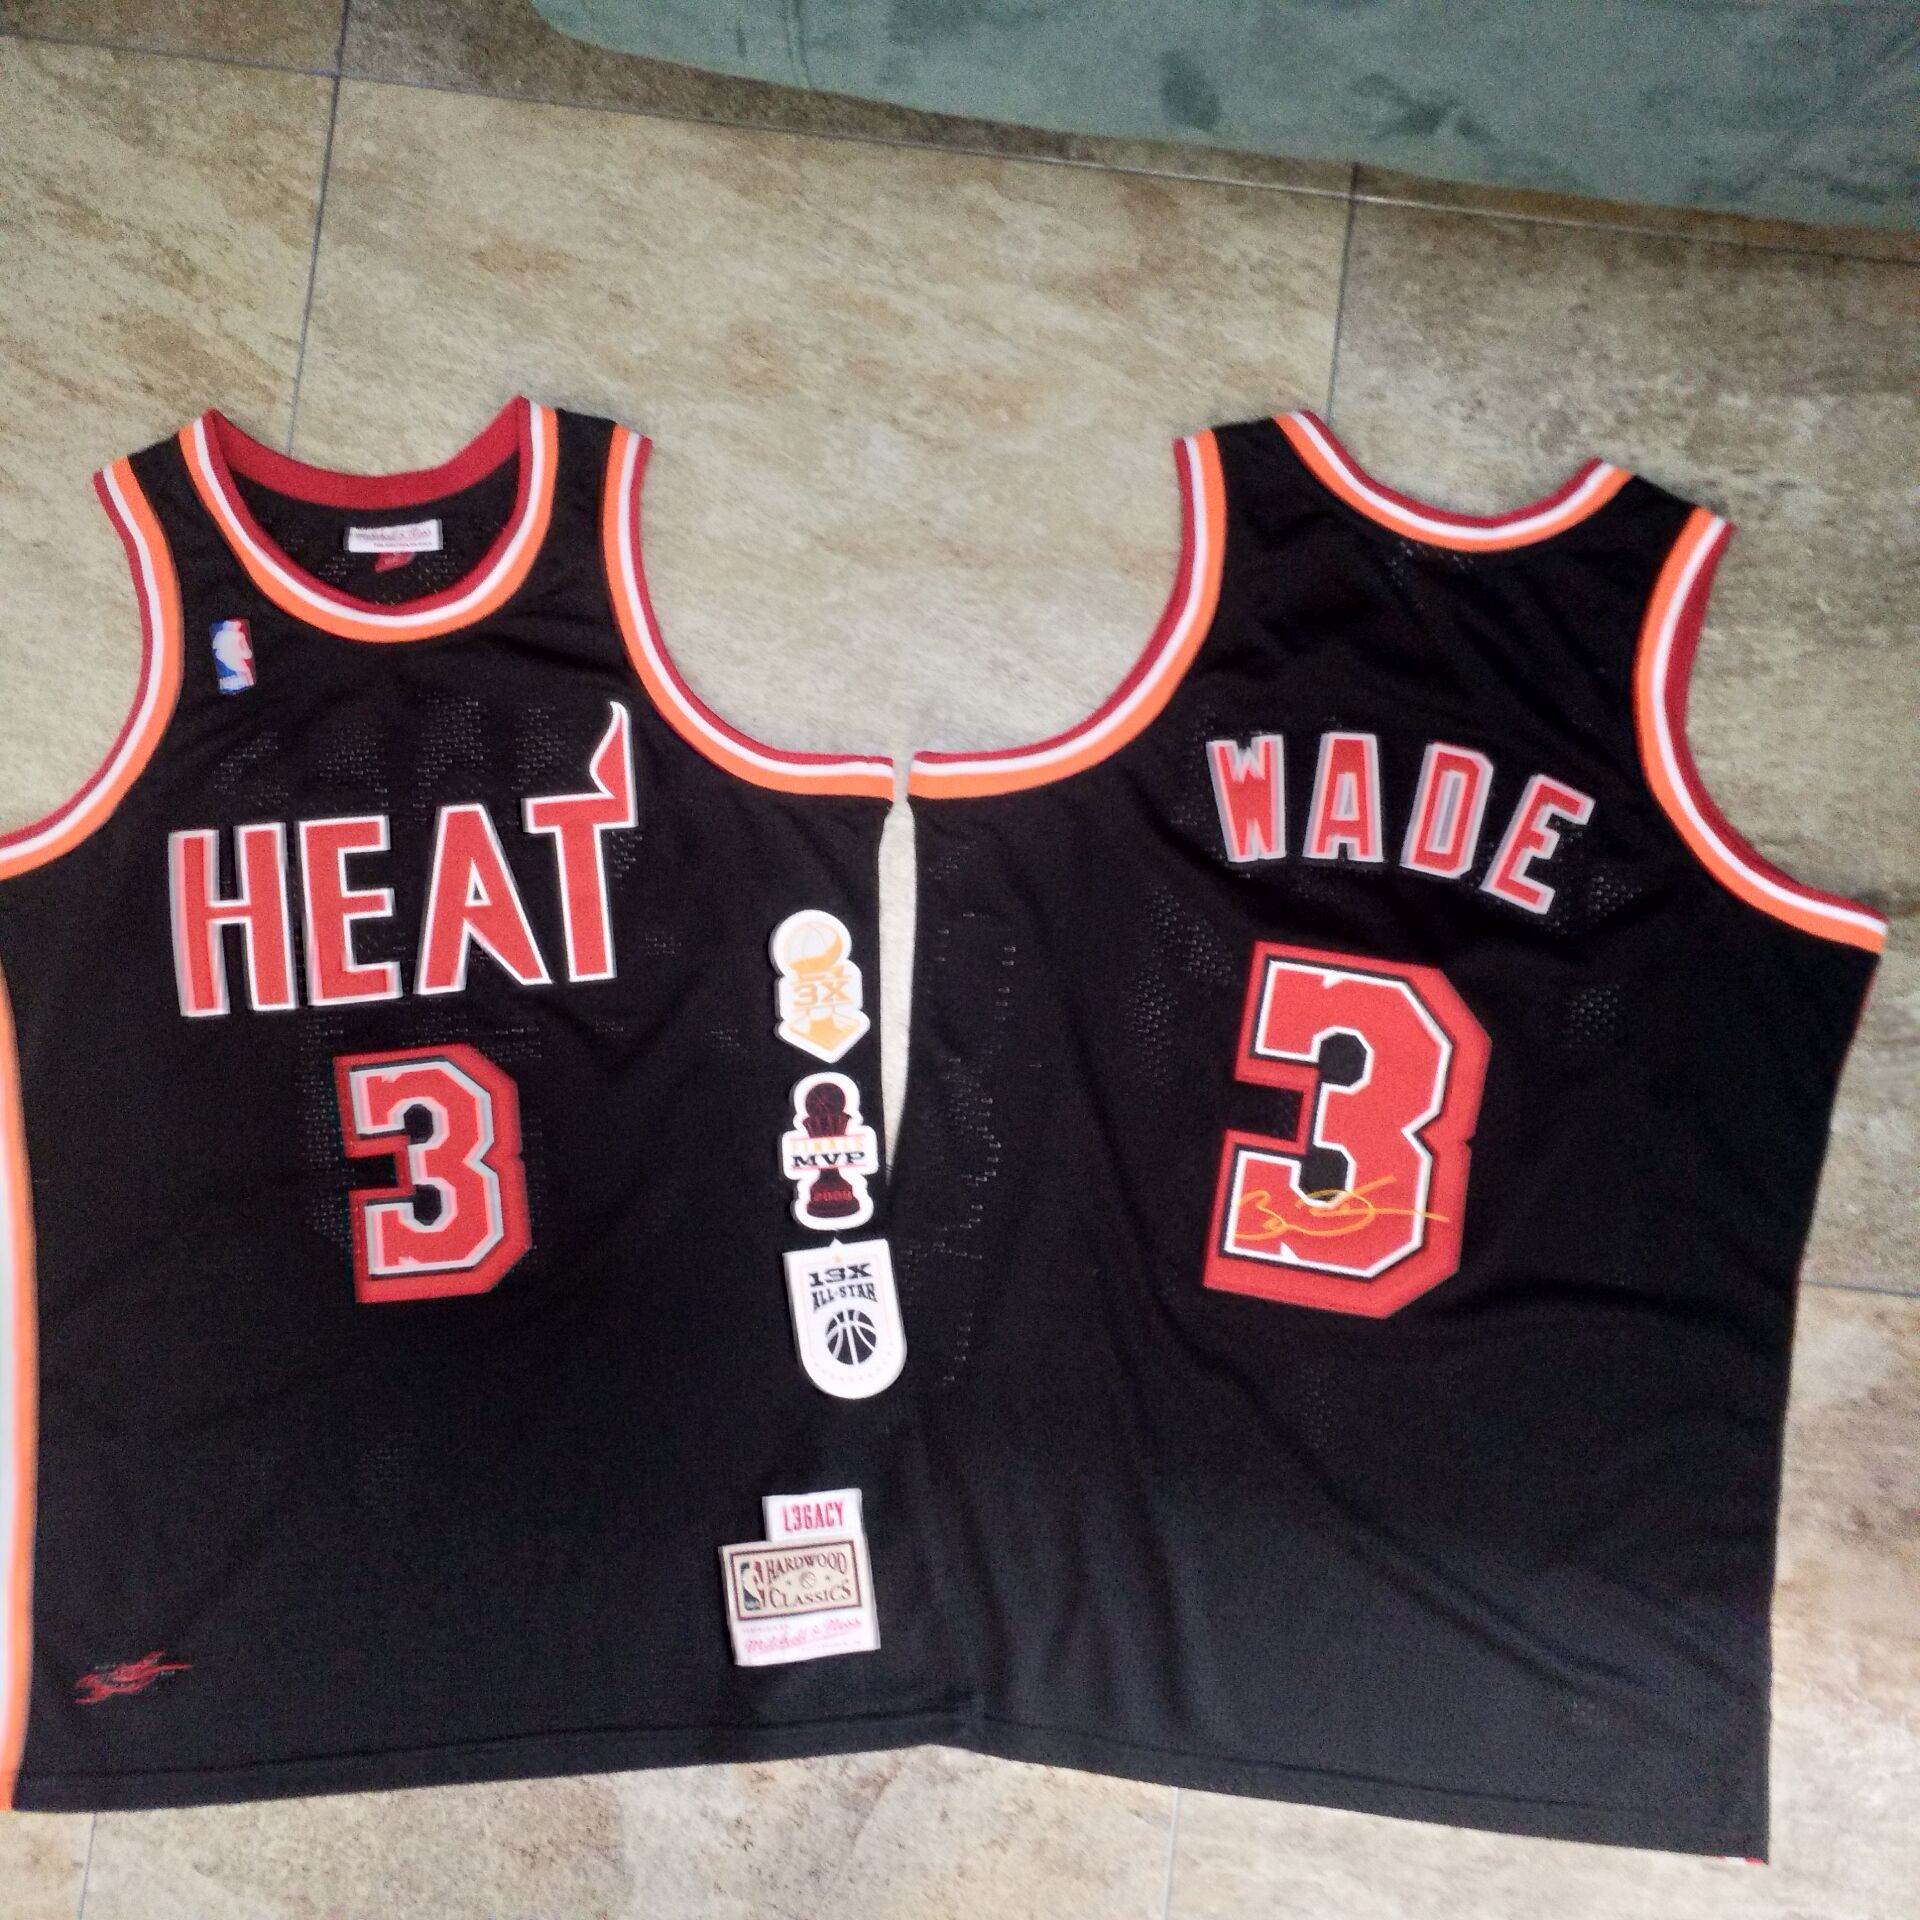 Heat 3 Dwyane Wade Black Hardwood Classics Swingman Jersey